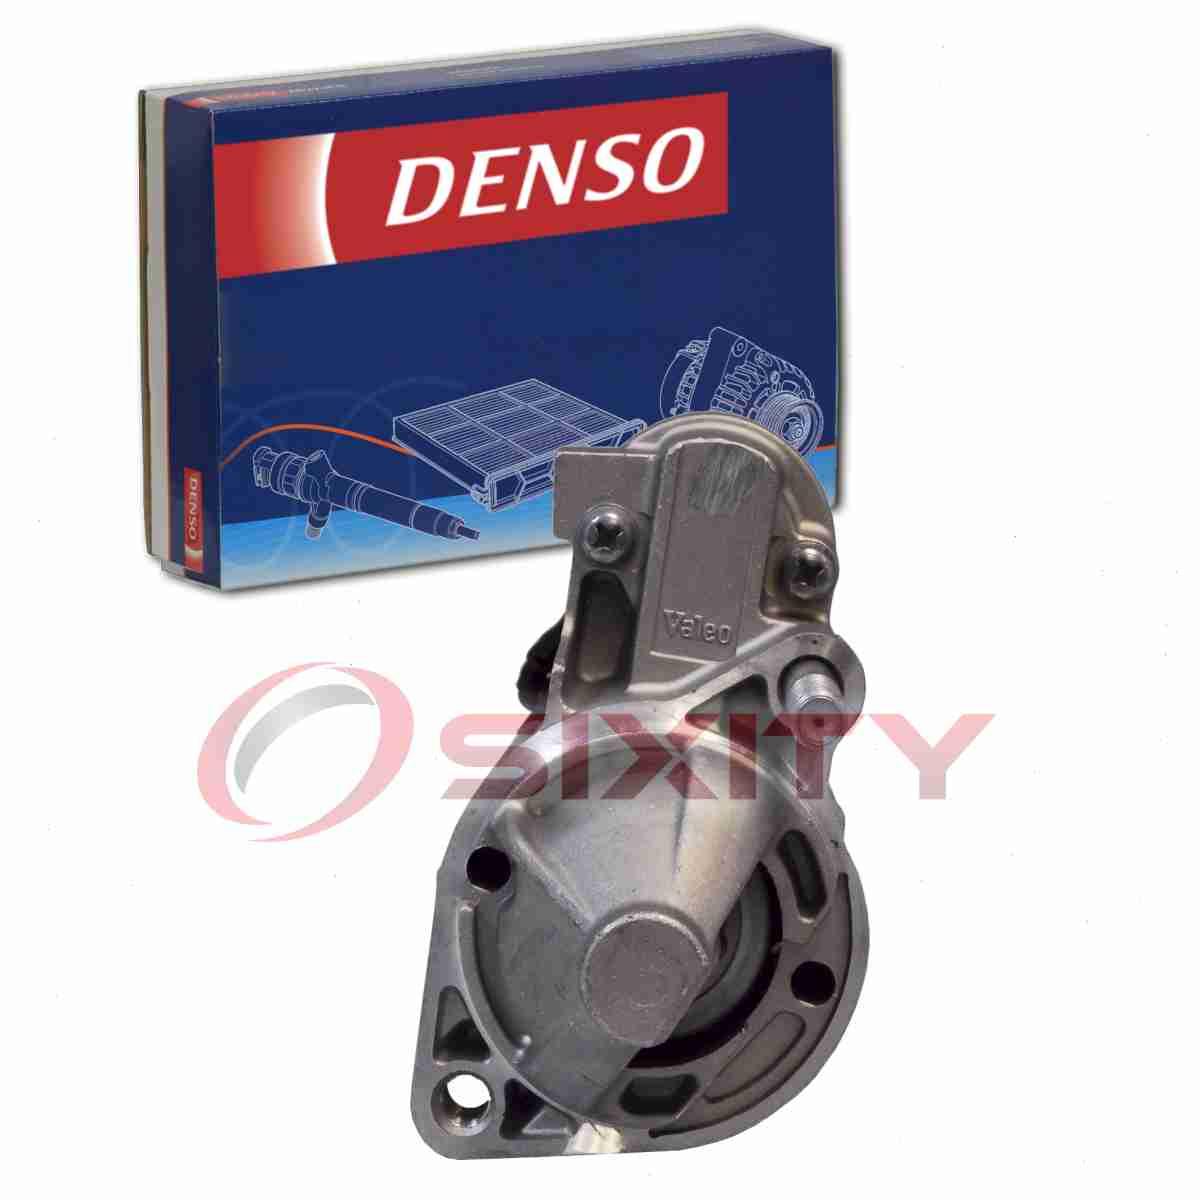 2004 Kia Amanti Parts Fuse Box Denso Starter Motor For Electrical 1200x1200